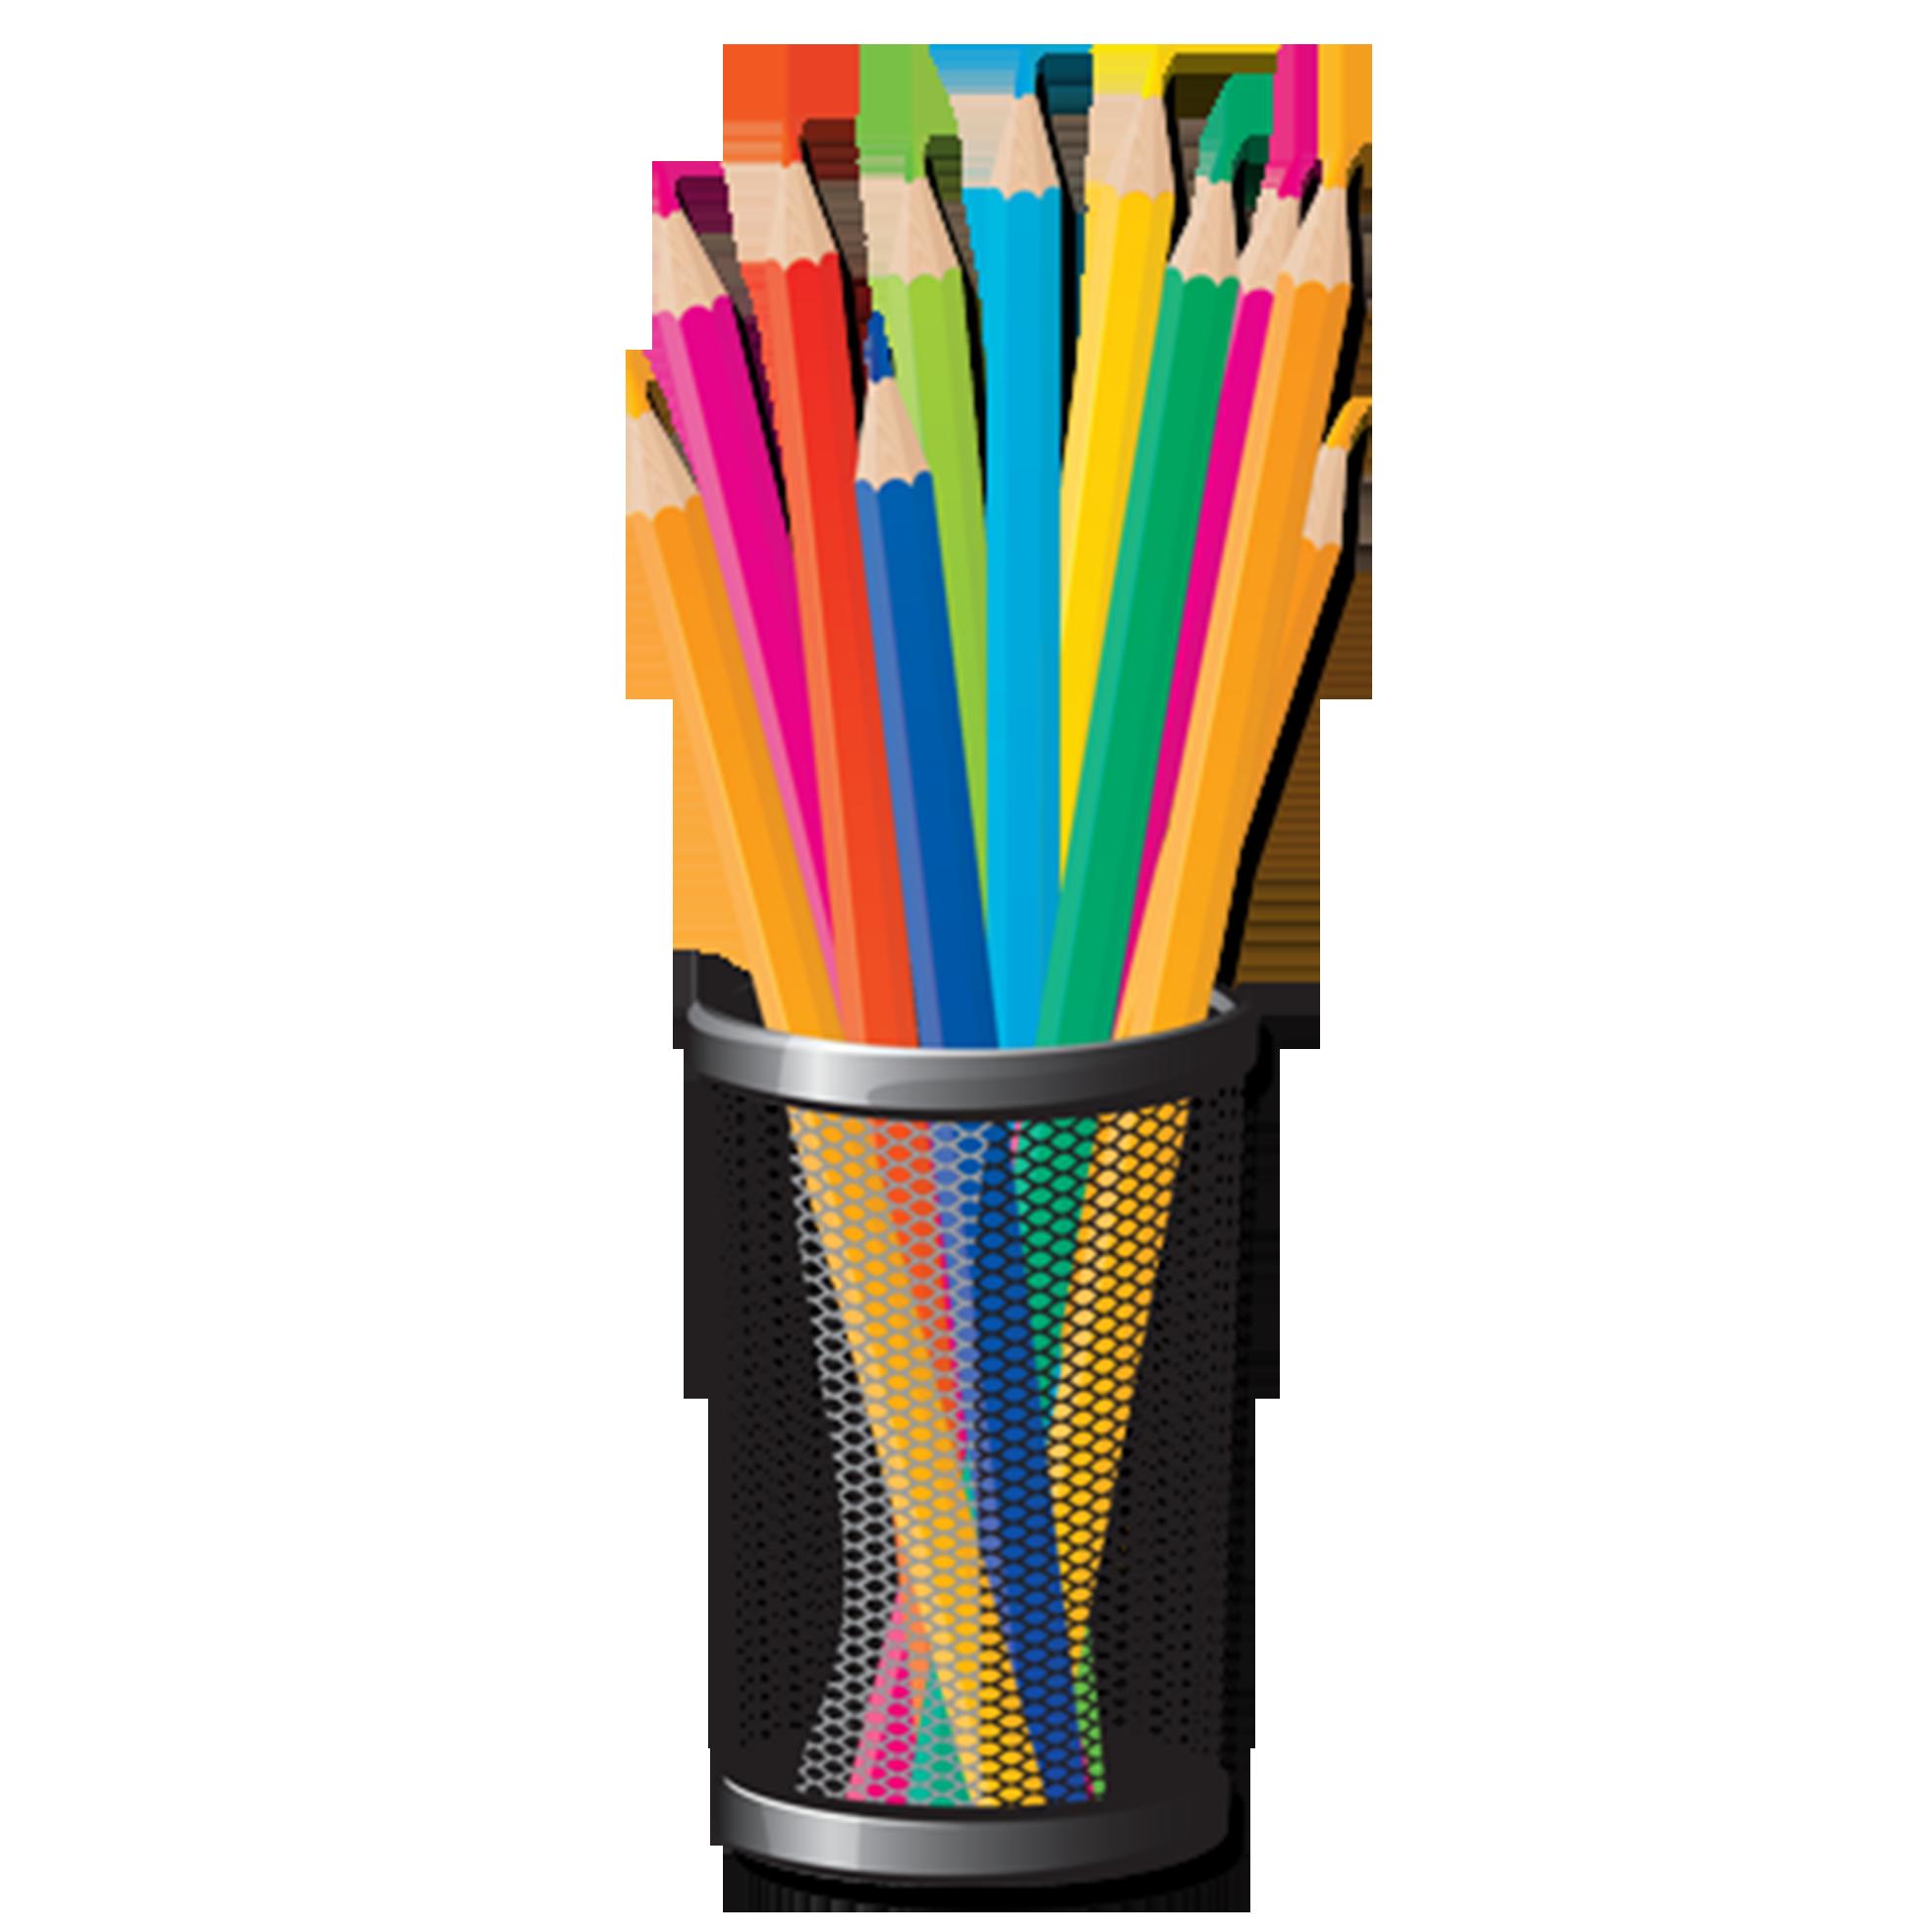 Crayon clip art hand. Paintbrush clipart colored pencil